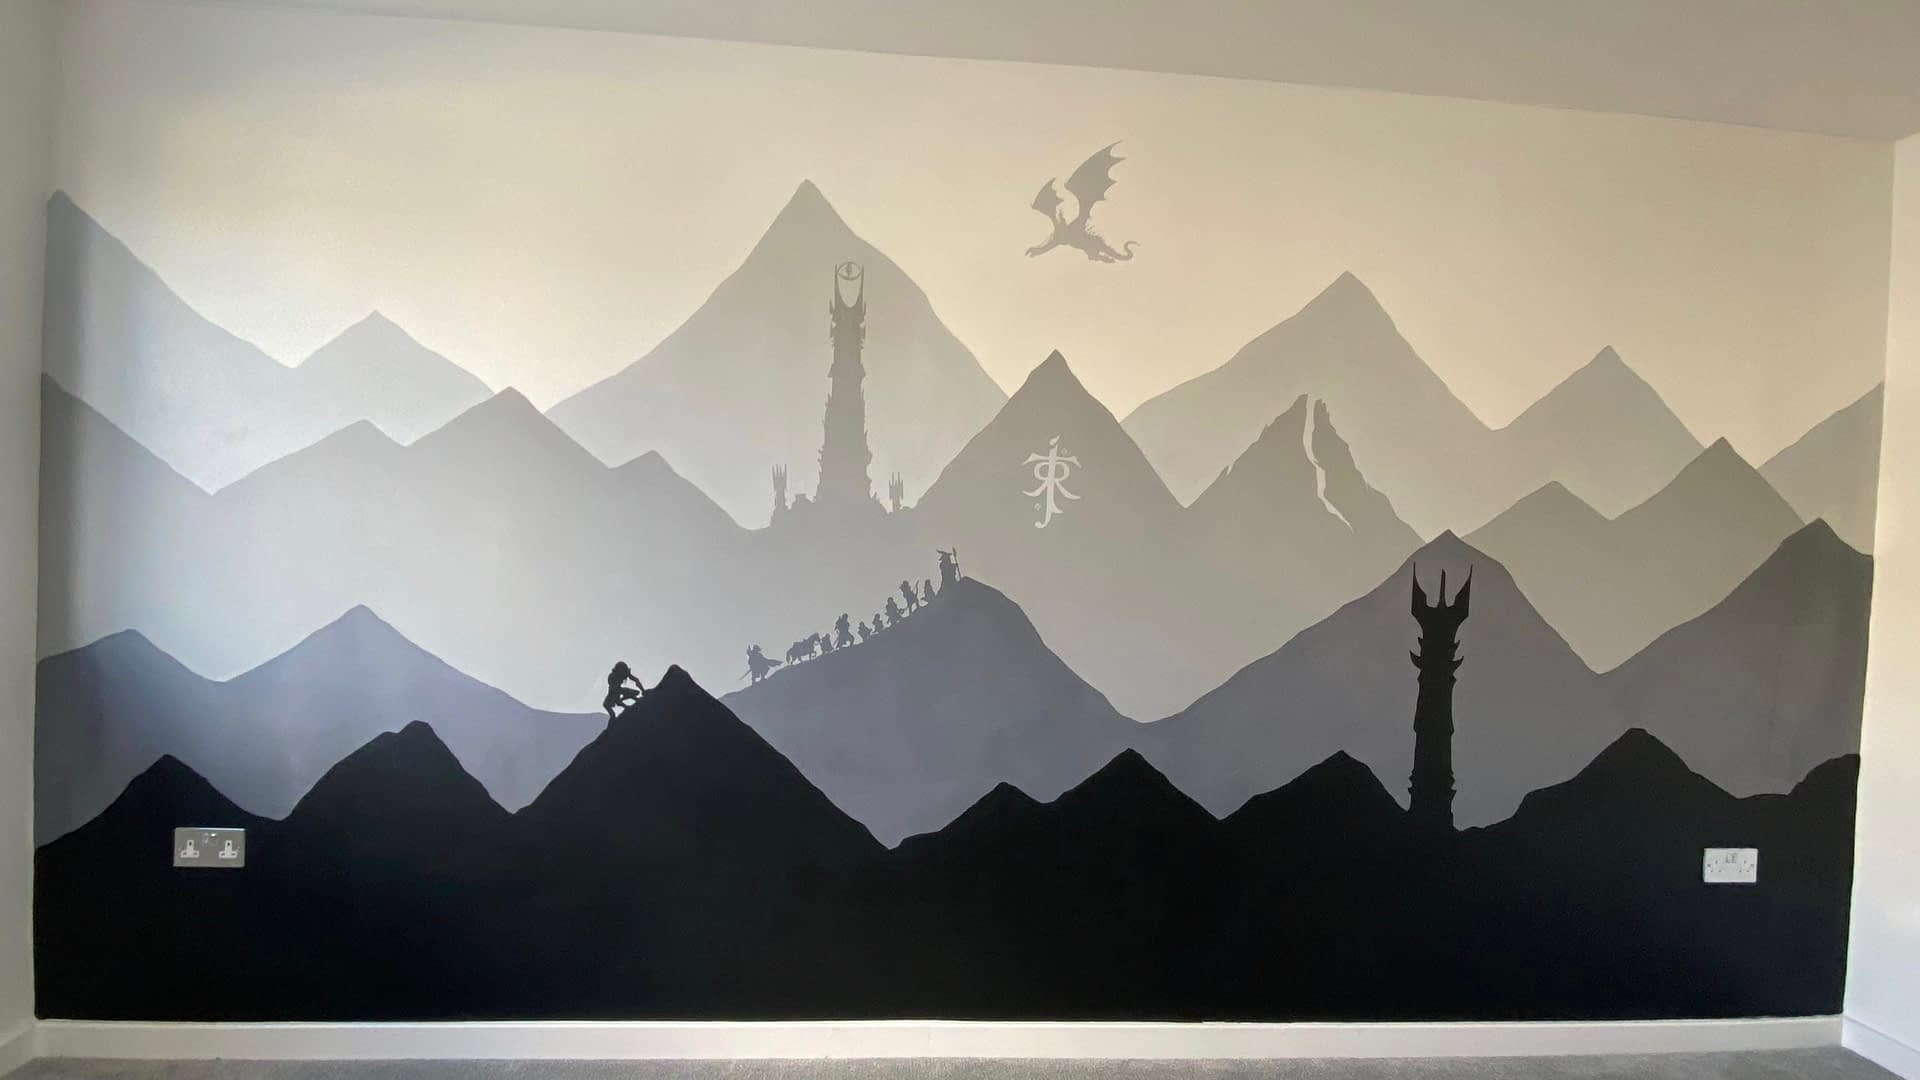 LOTR Mural